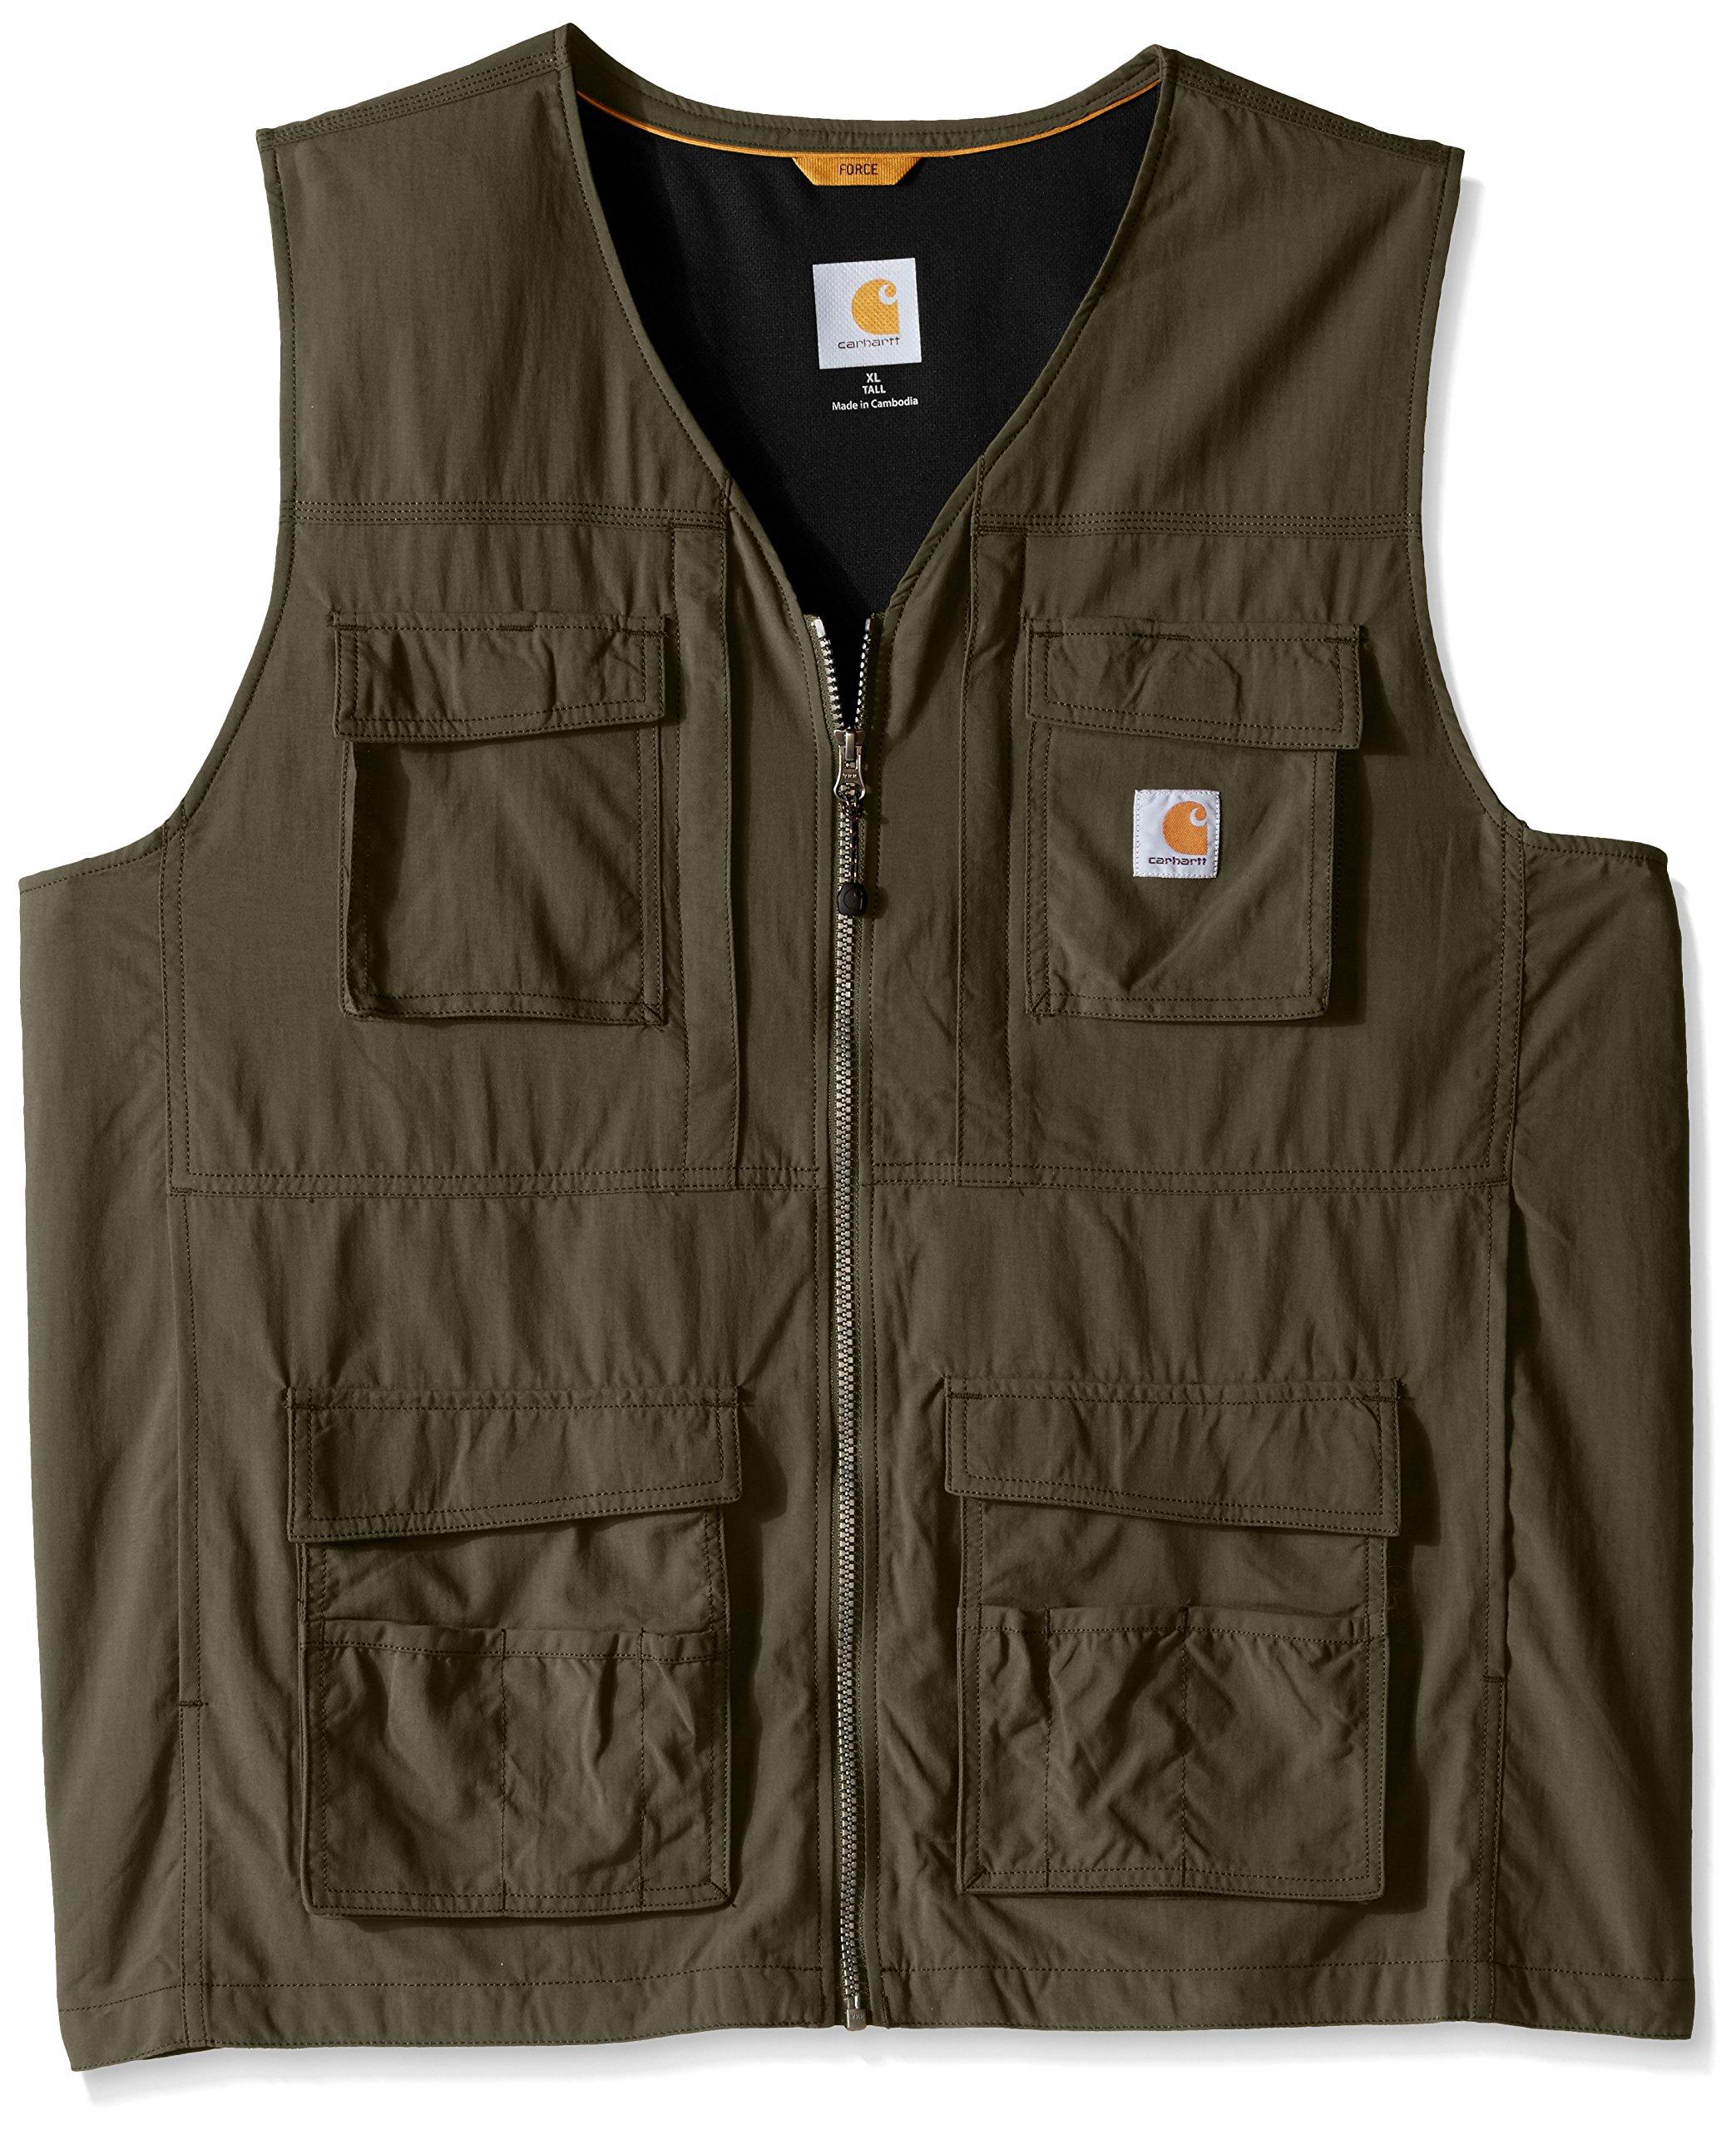 Carhartt Men's Big Briscoe Vest, Moss, 2X-Large/Tall